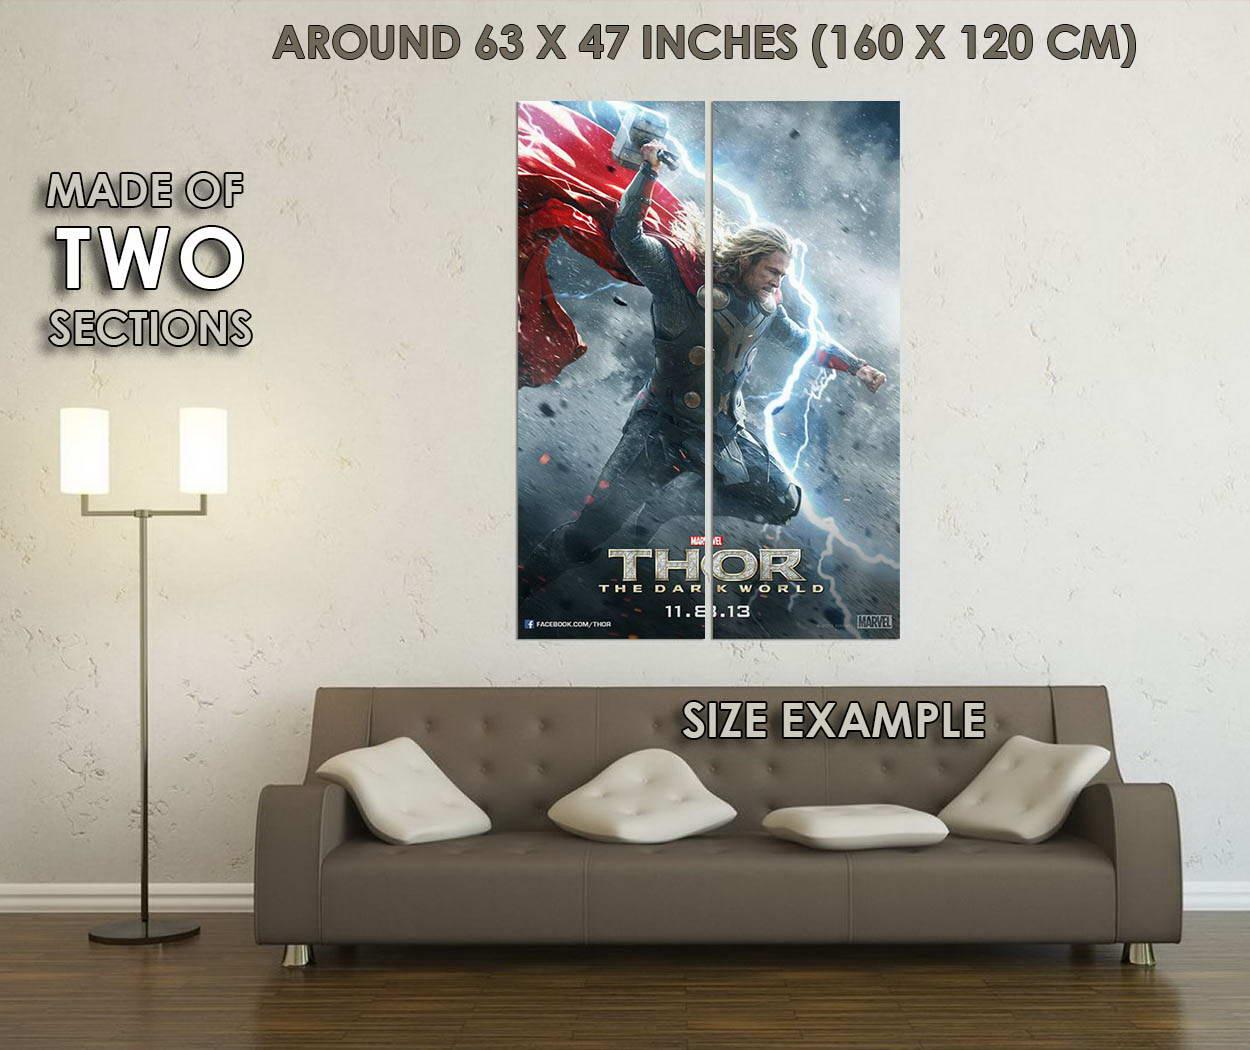 10514-Thor-2-The-Dark-World-Movie-Loki-LAMINATED-POSTER-CA thumbnail 6